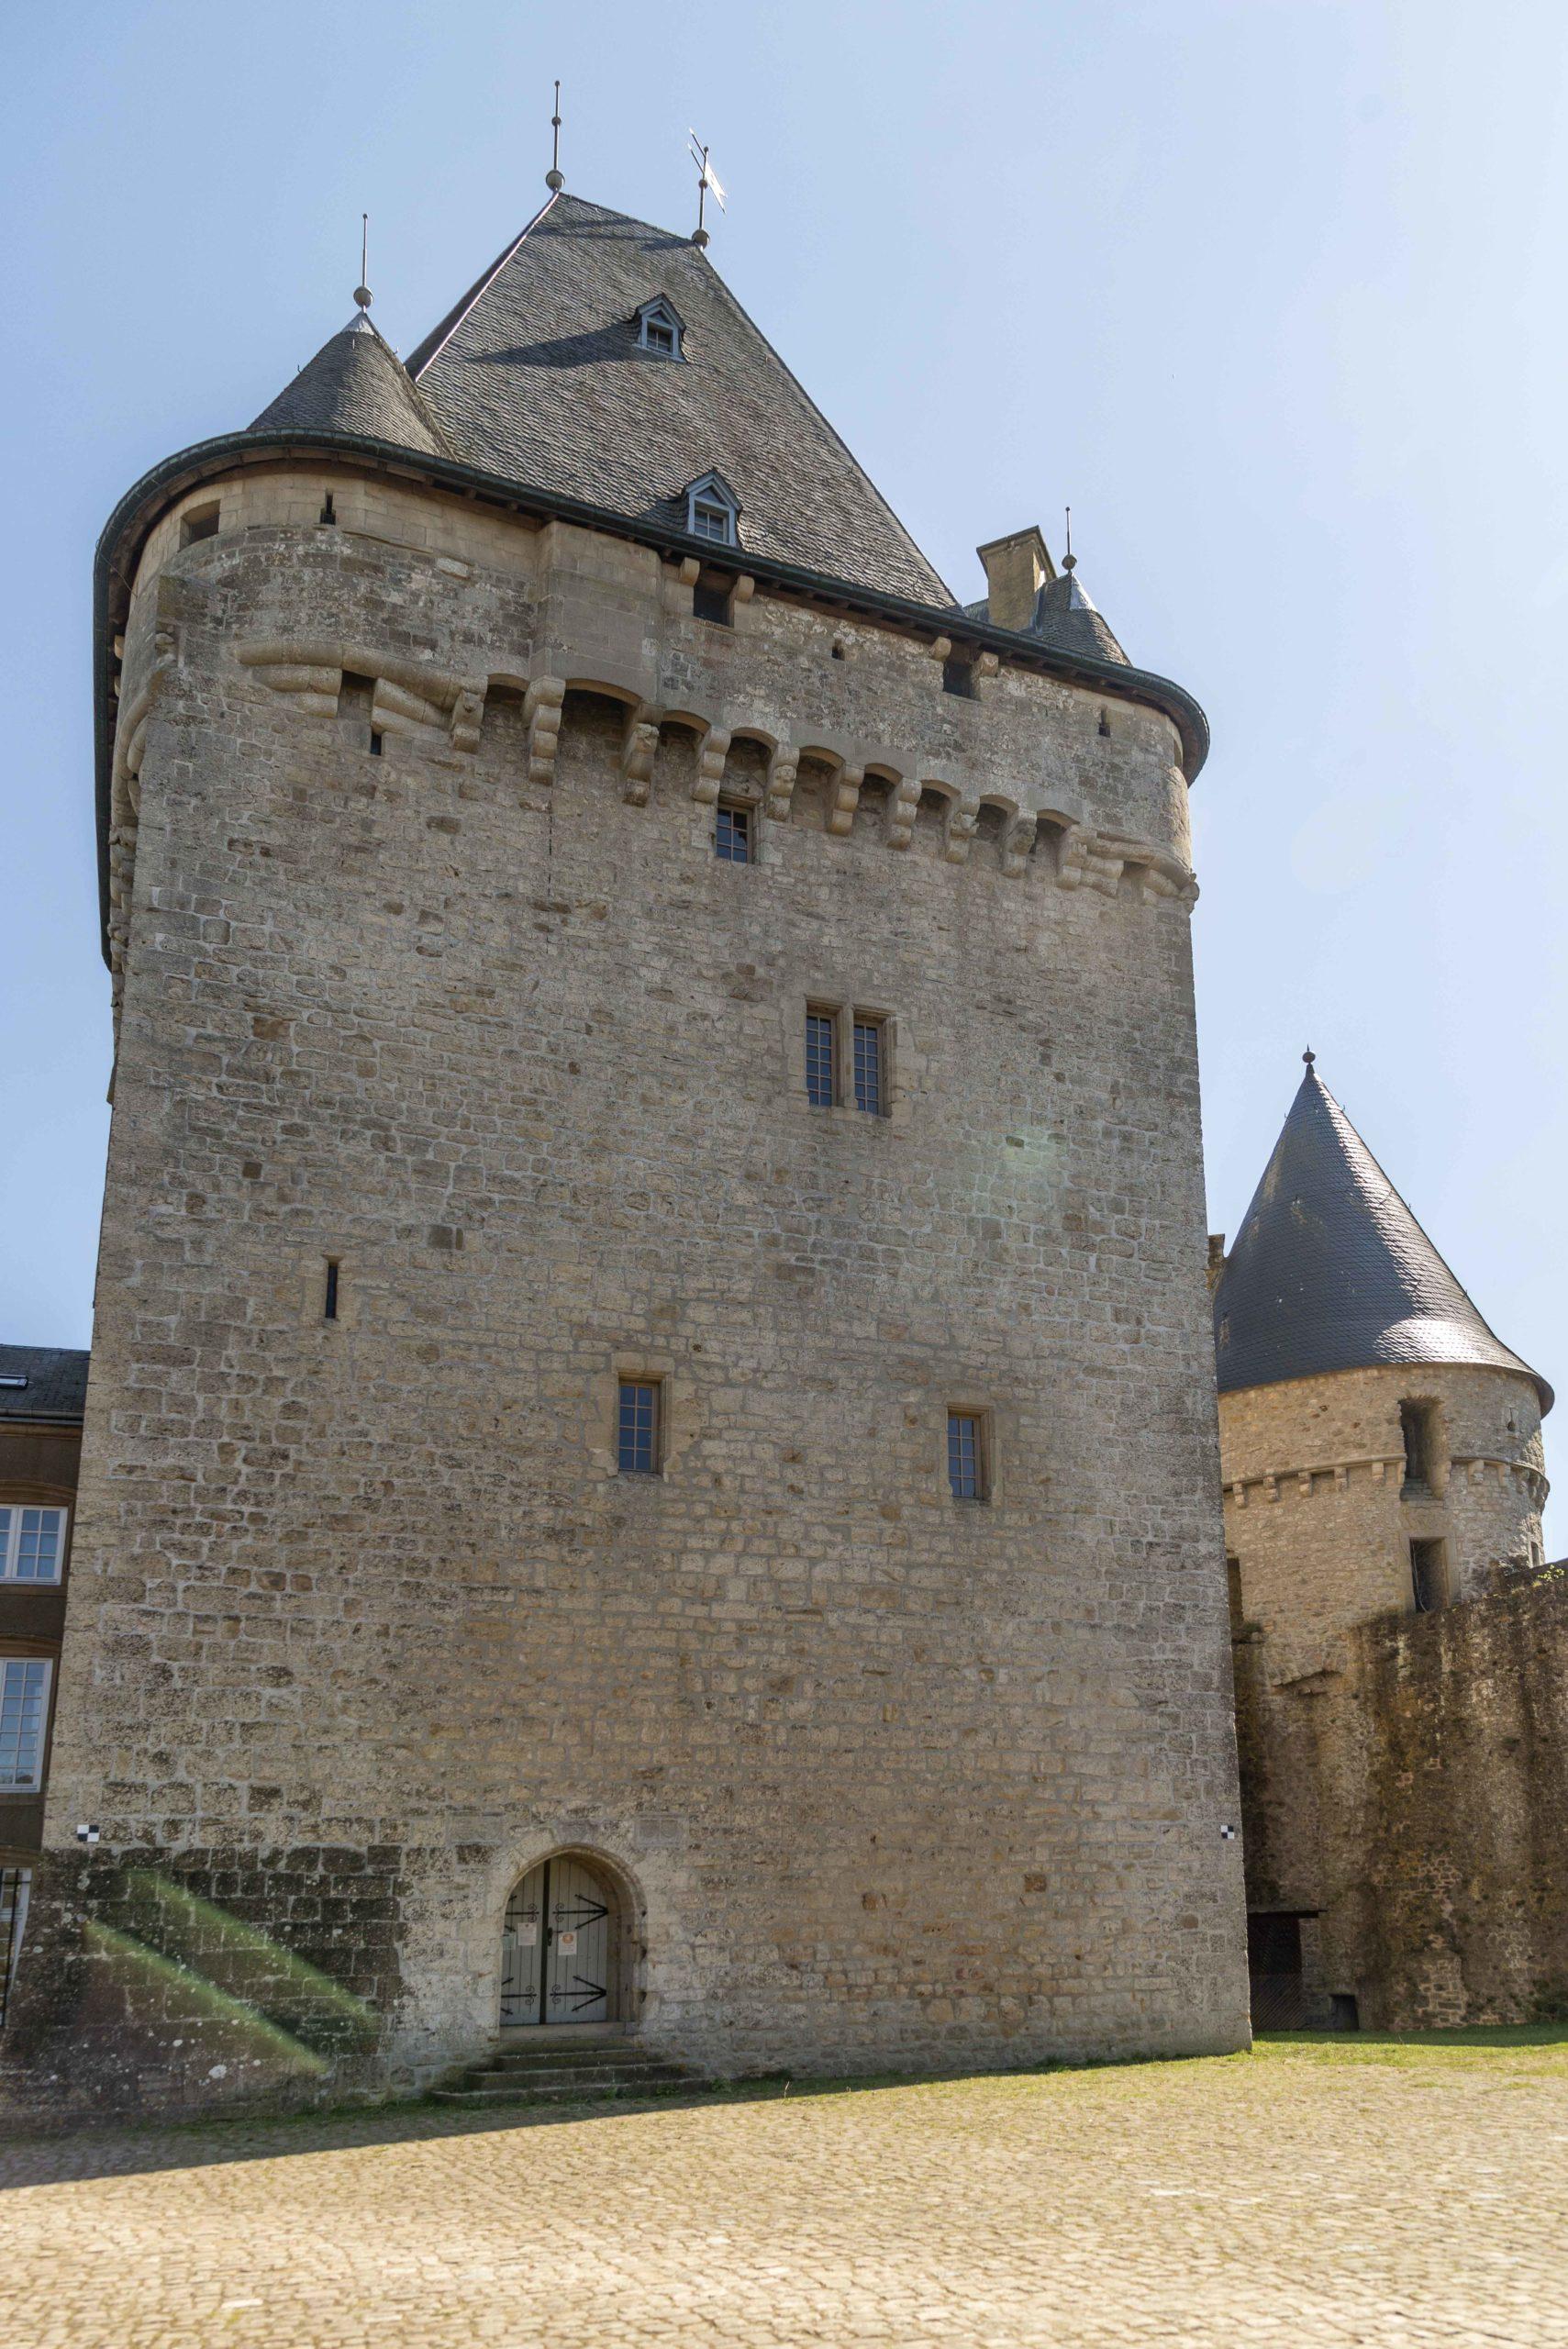 Burg Hollenfels